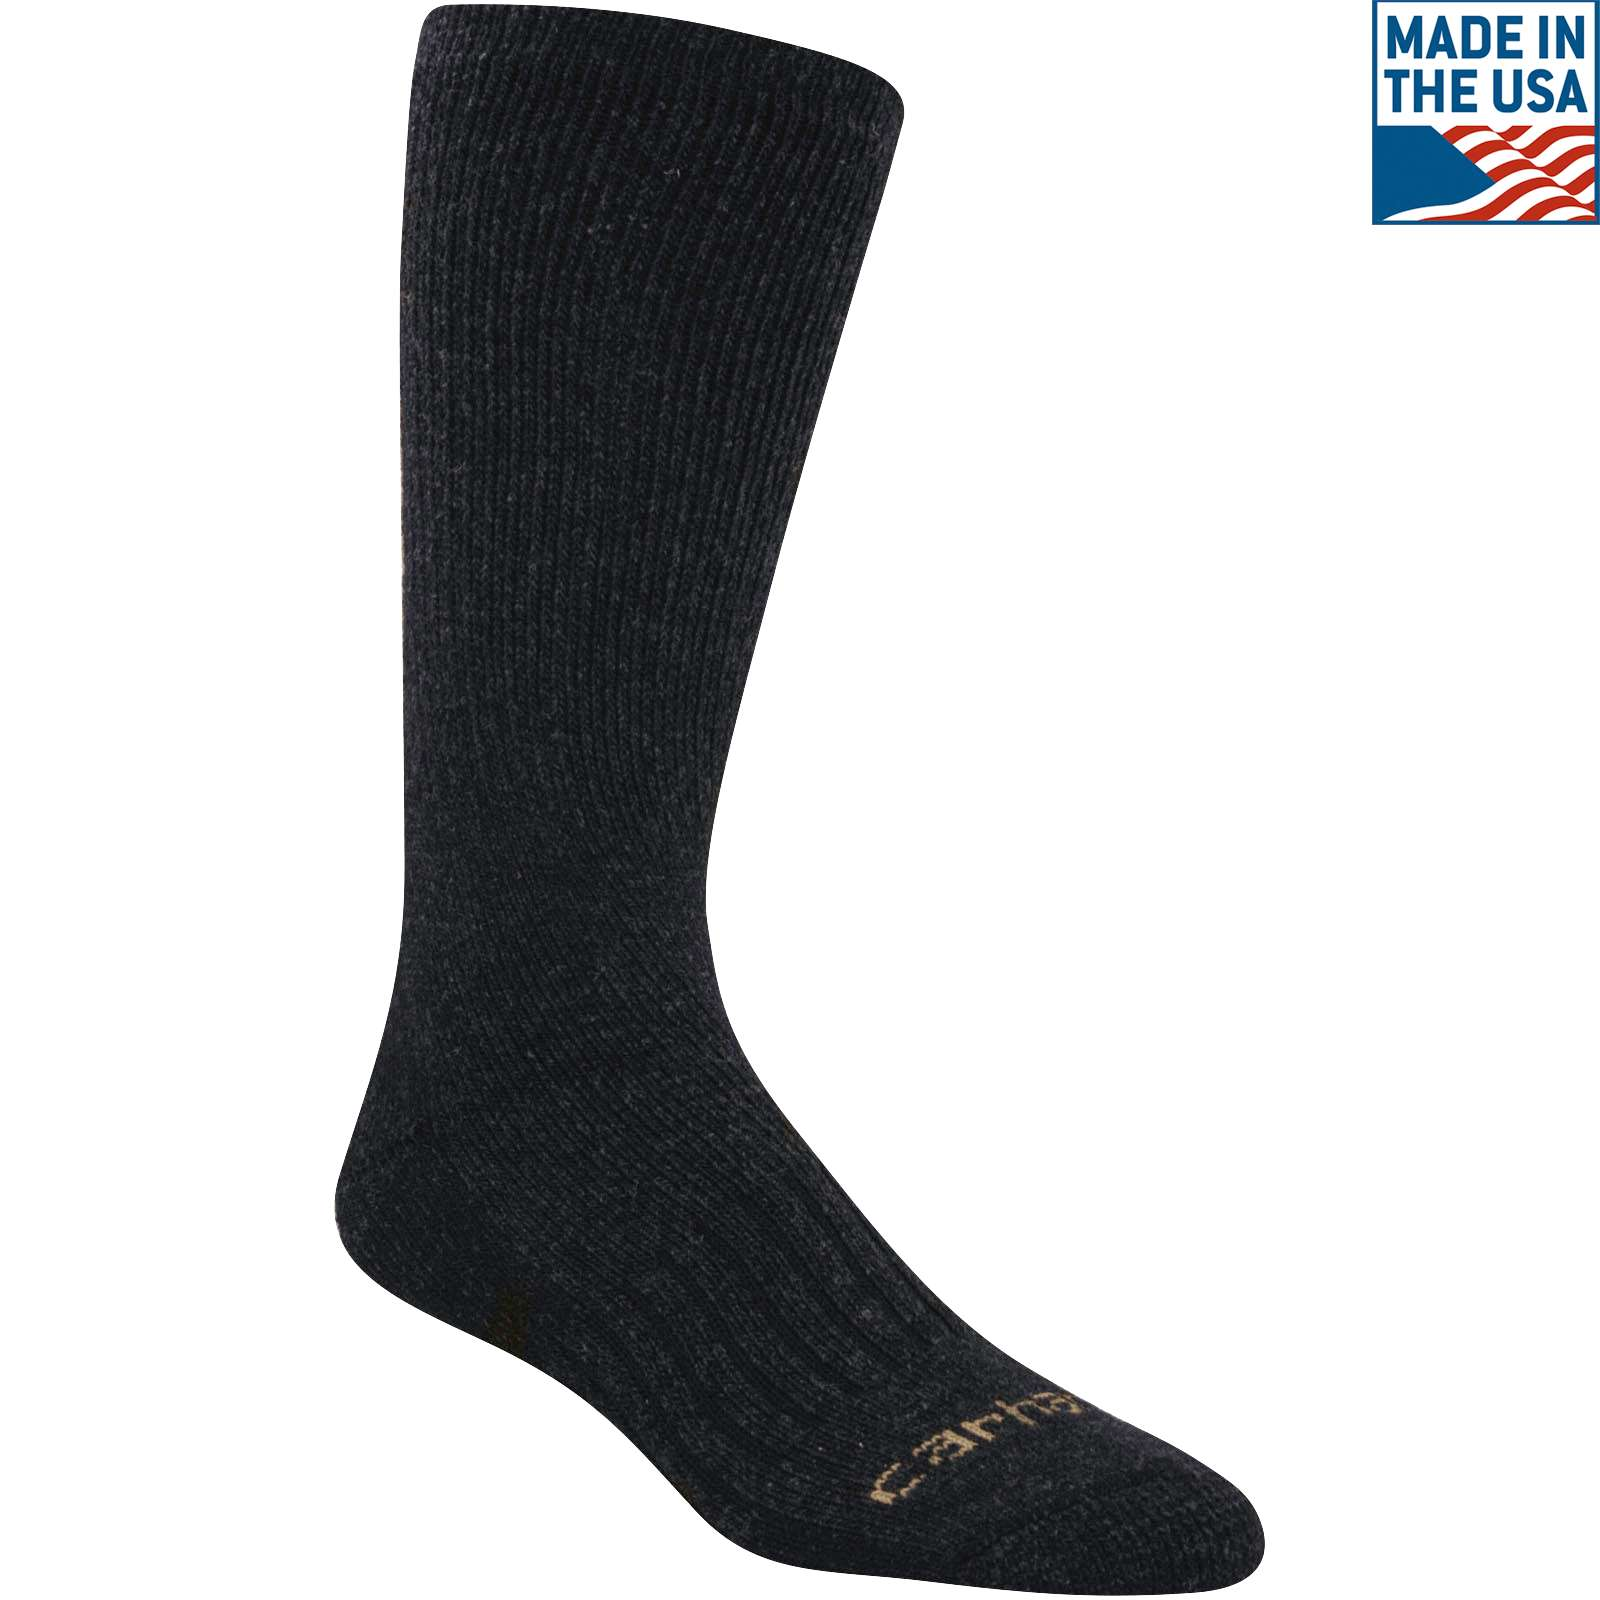 Carhartt Base-layer Liner Sock (3 Pack)